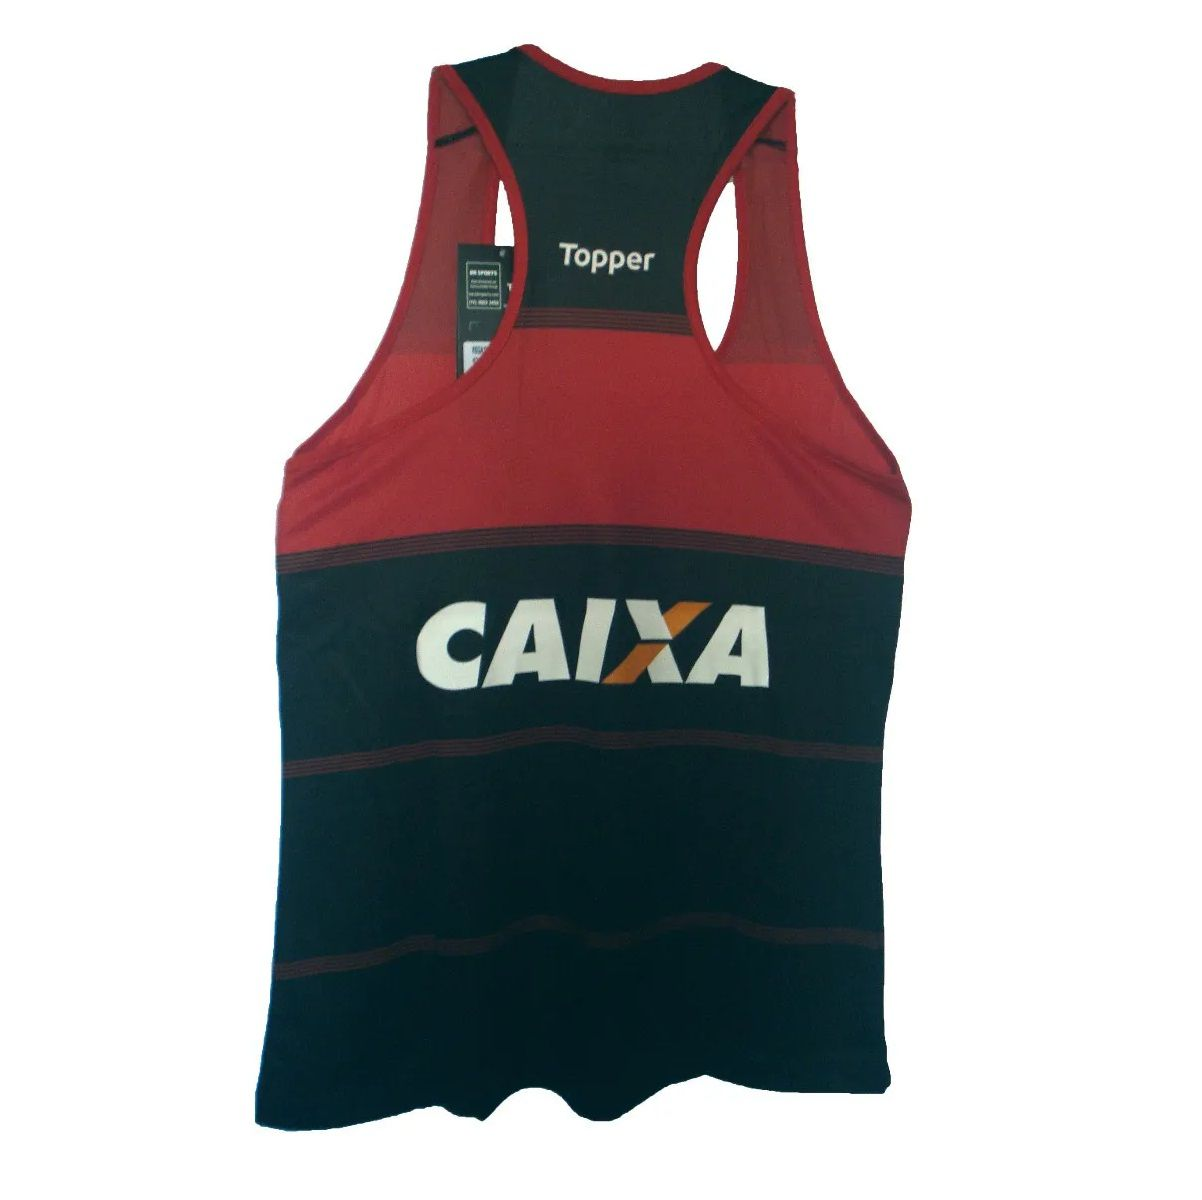 Camisa Regata - Topper - 2018 - Masculina - Vermelho